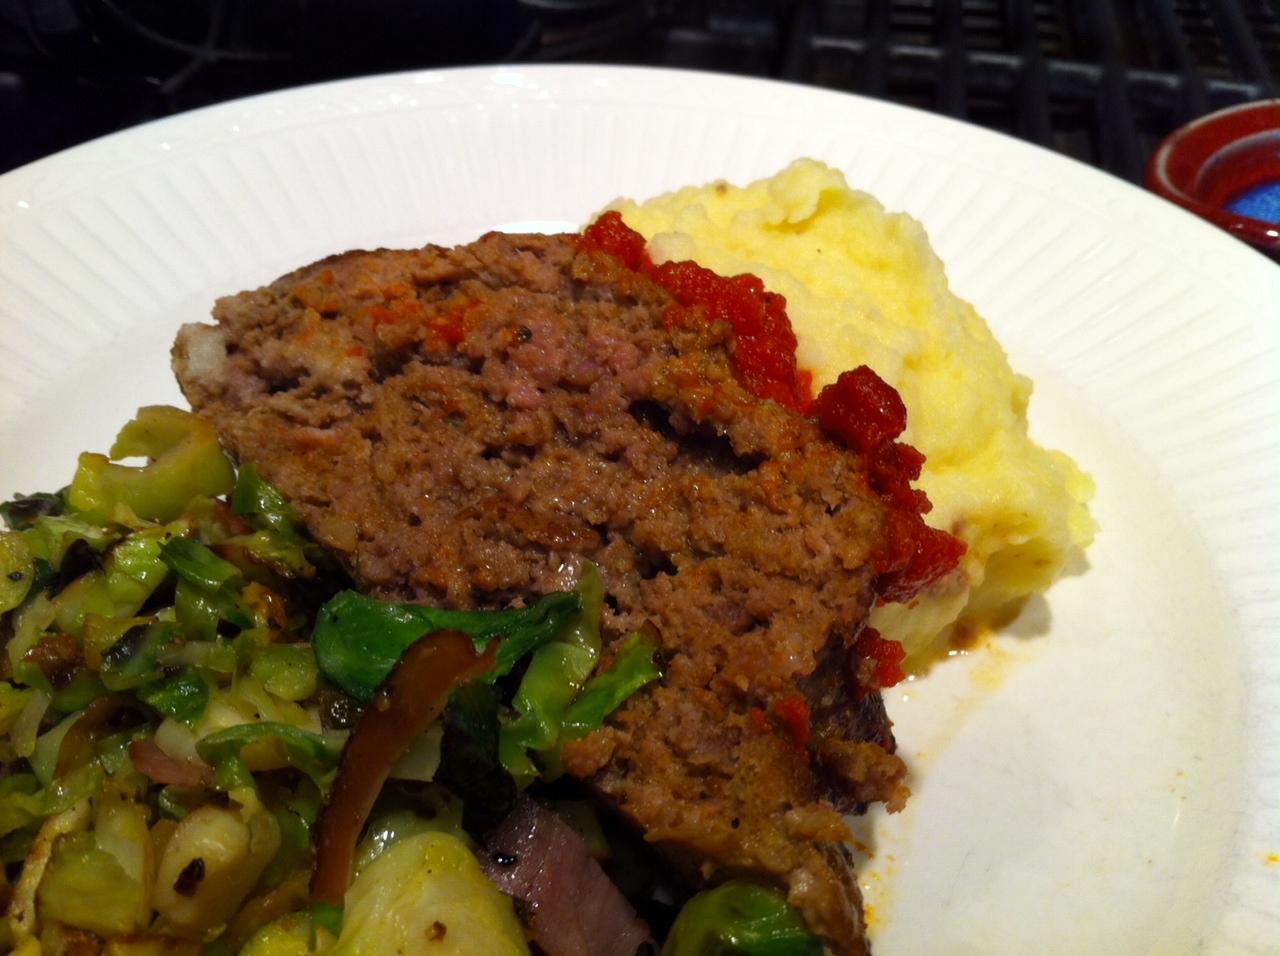 Meat and Potatoes Menu Idea – Comfort Food